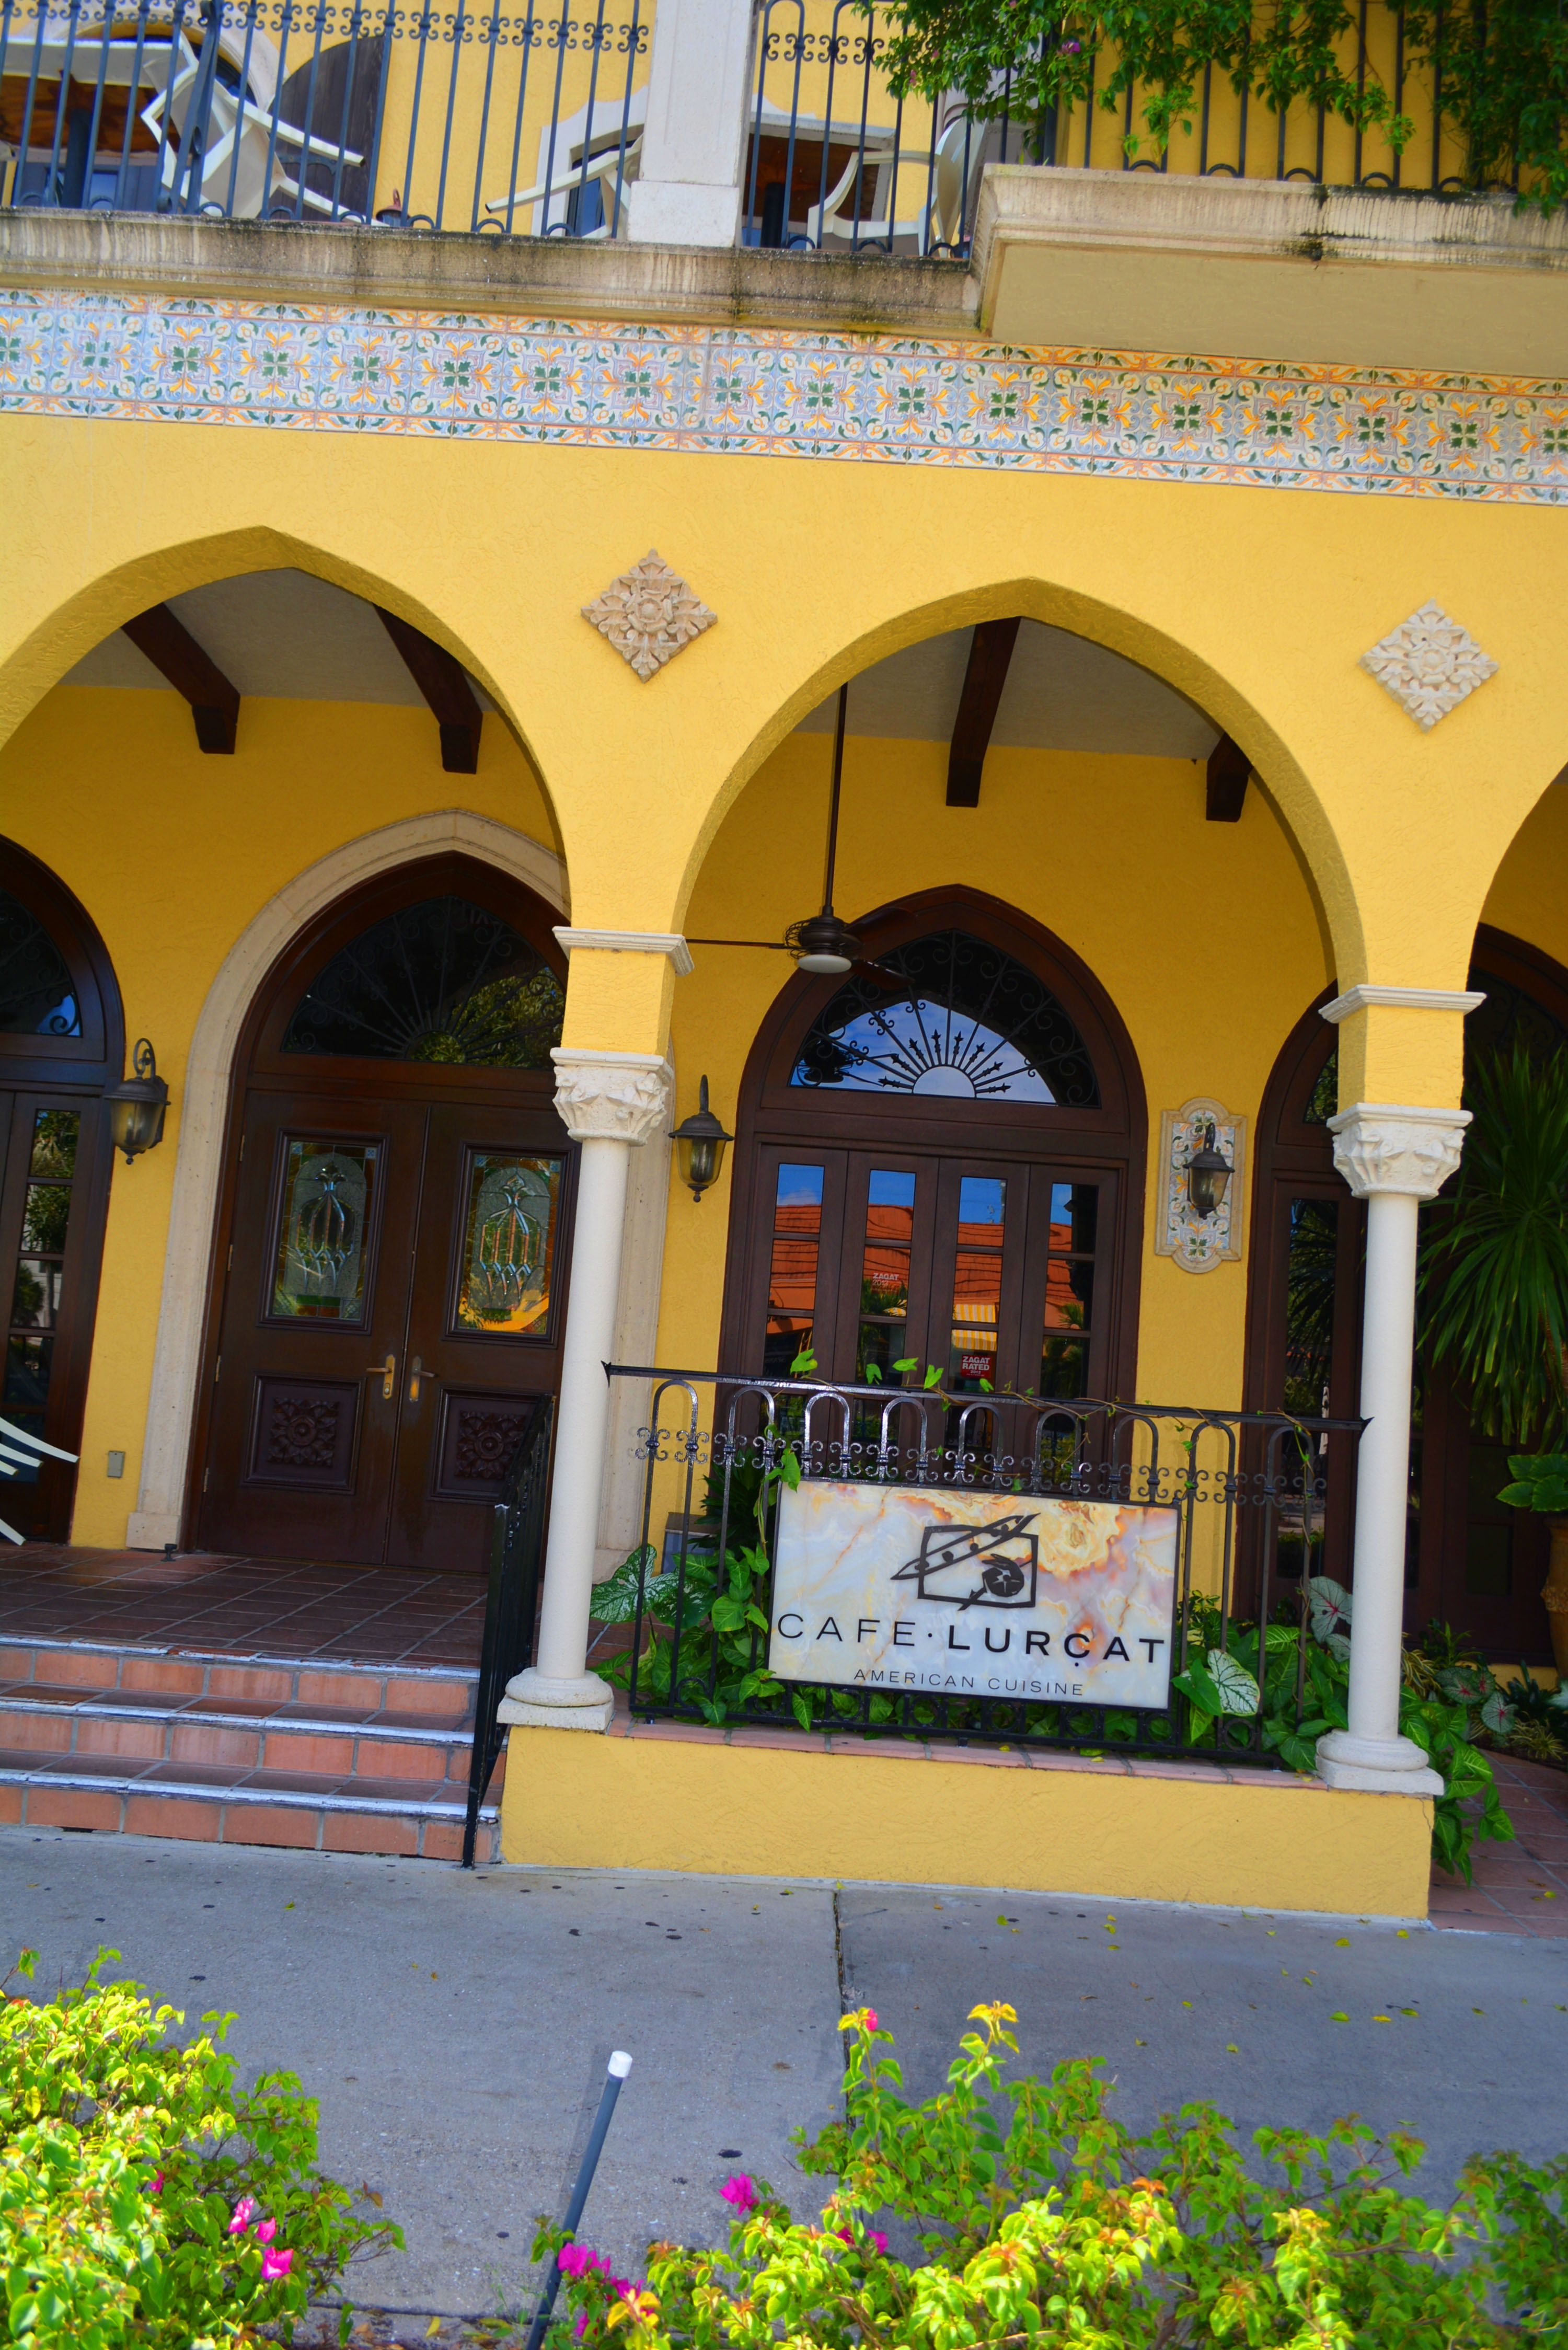 Cafe Lurcat On Fifth Avenue South Naplesrealestate Napleslifestyle